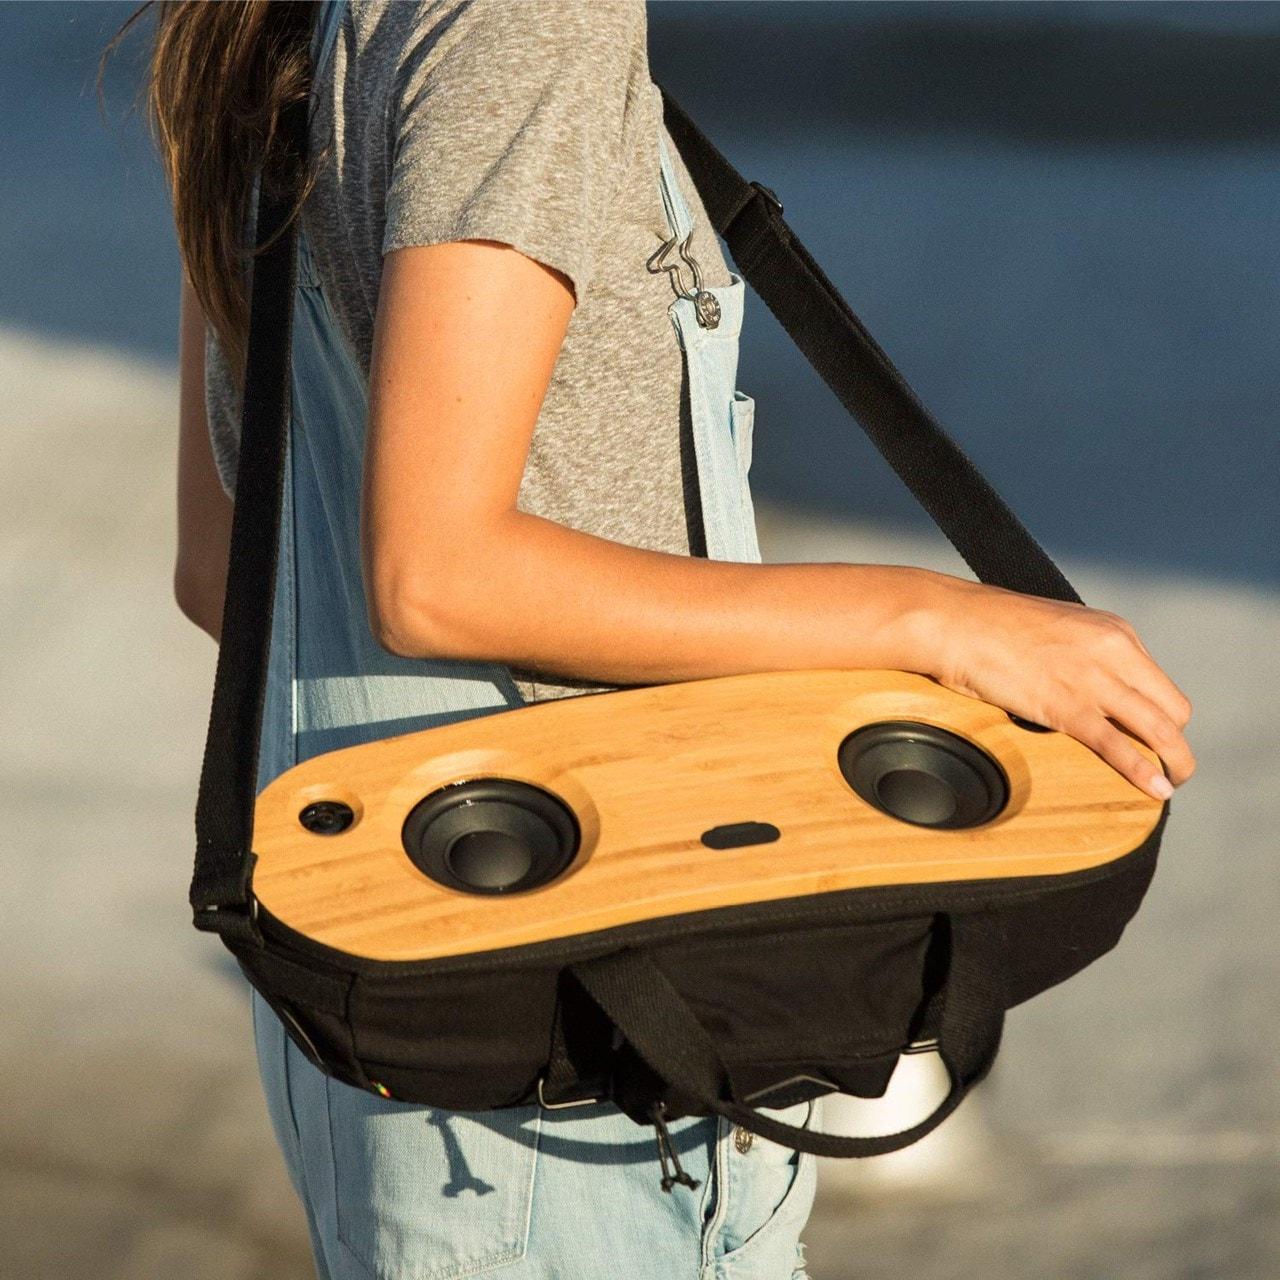 House Of Marley Bag Of Riddim 2 Bluetooth Speaker - 5